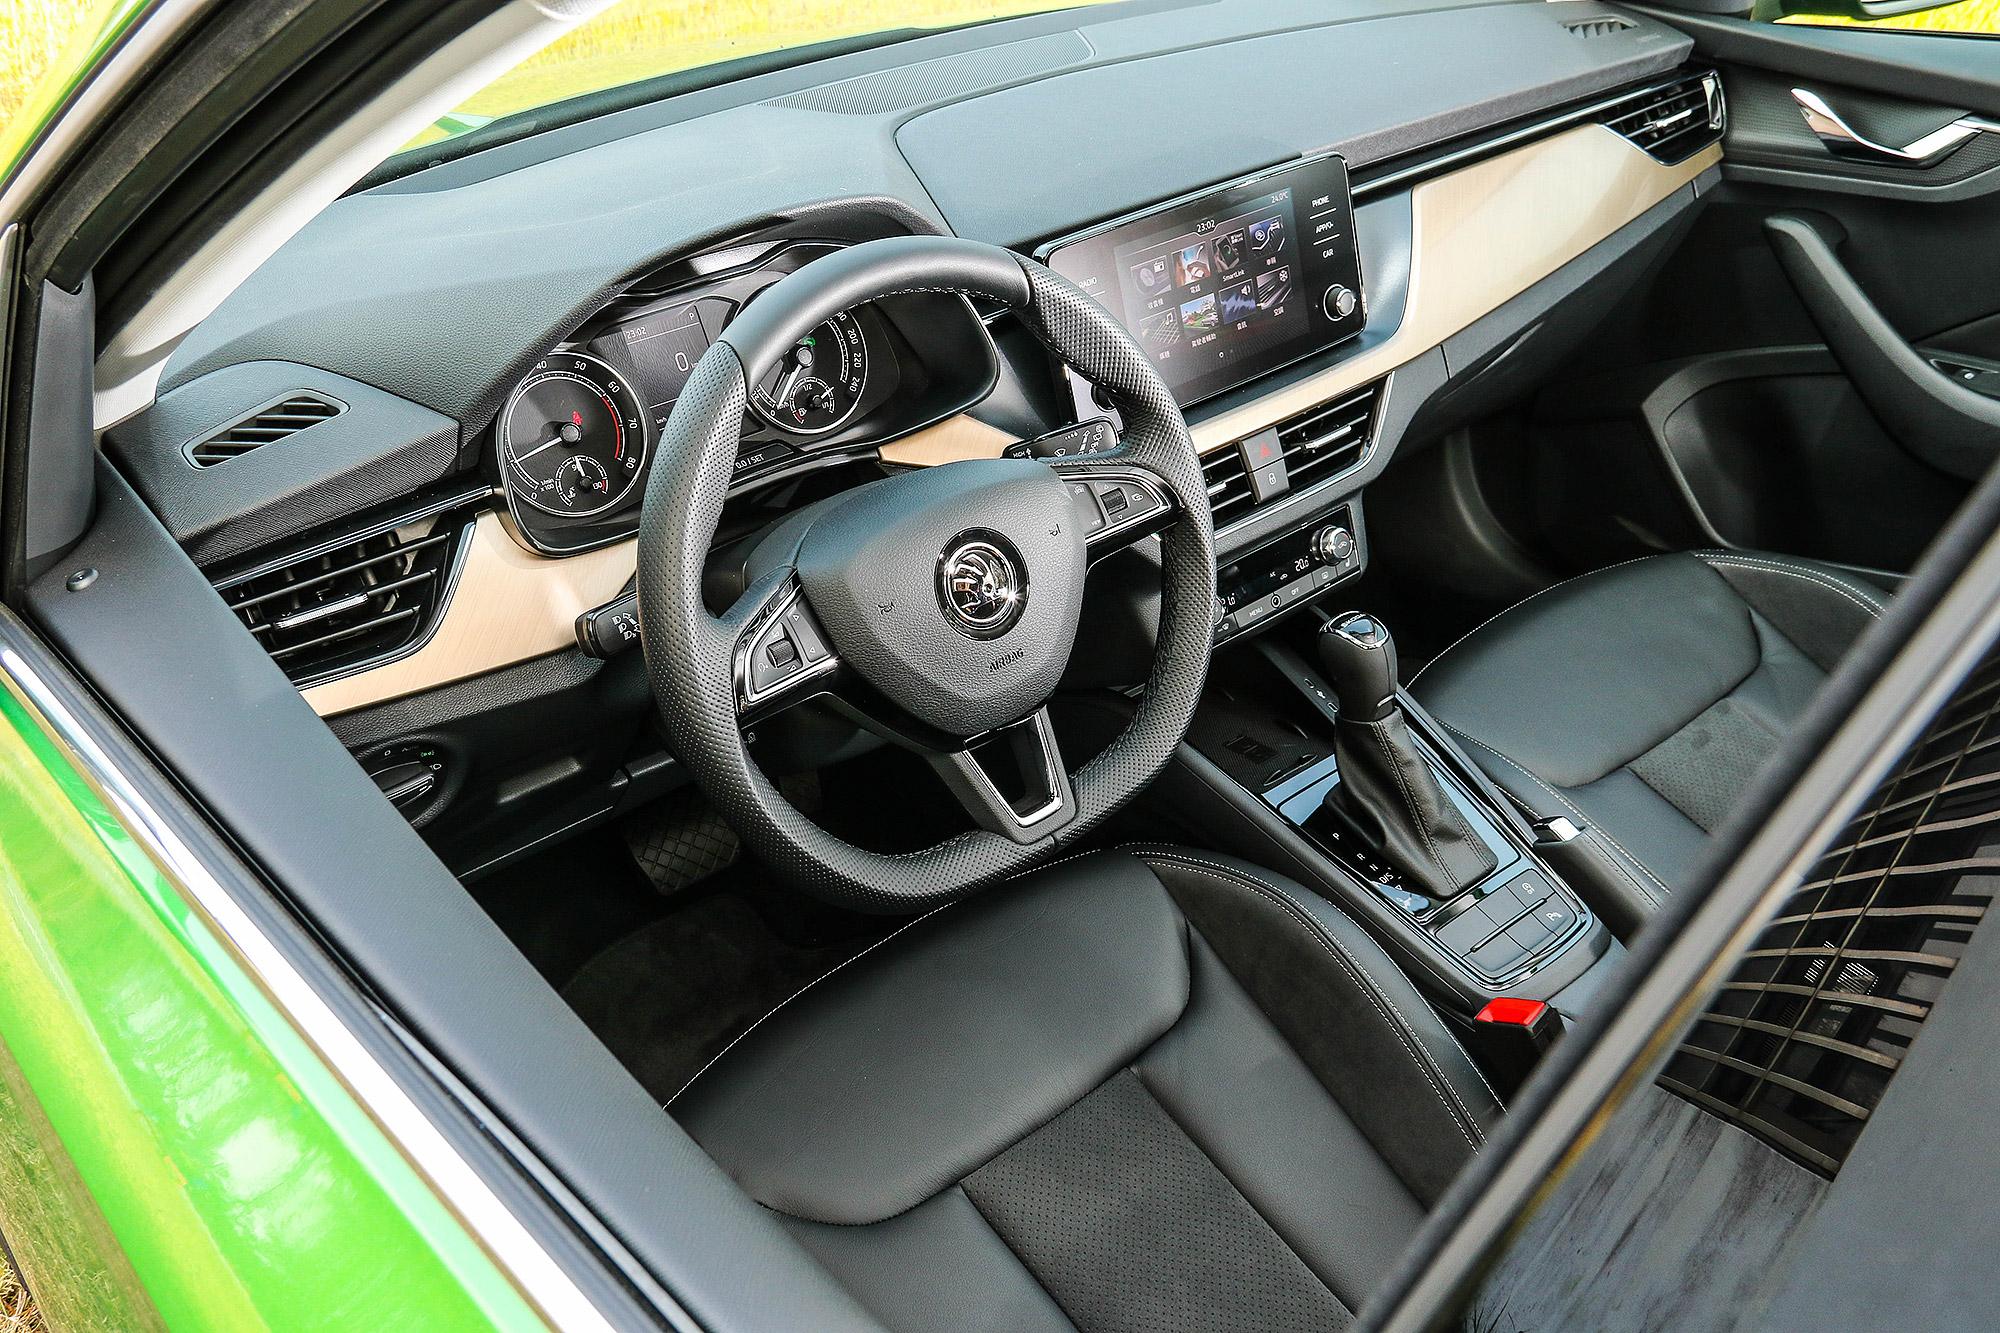 Scala 也是第一款使用全新內裝設計的 Škoda 產品。